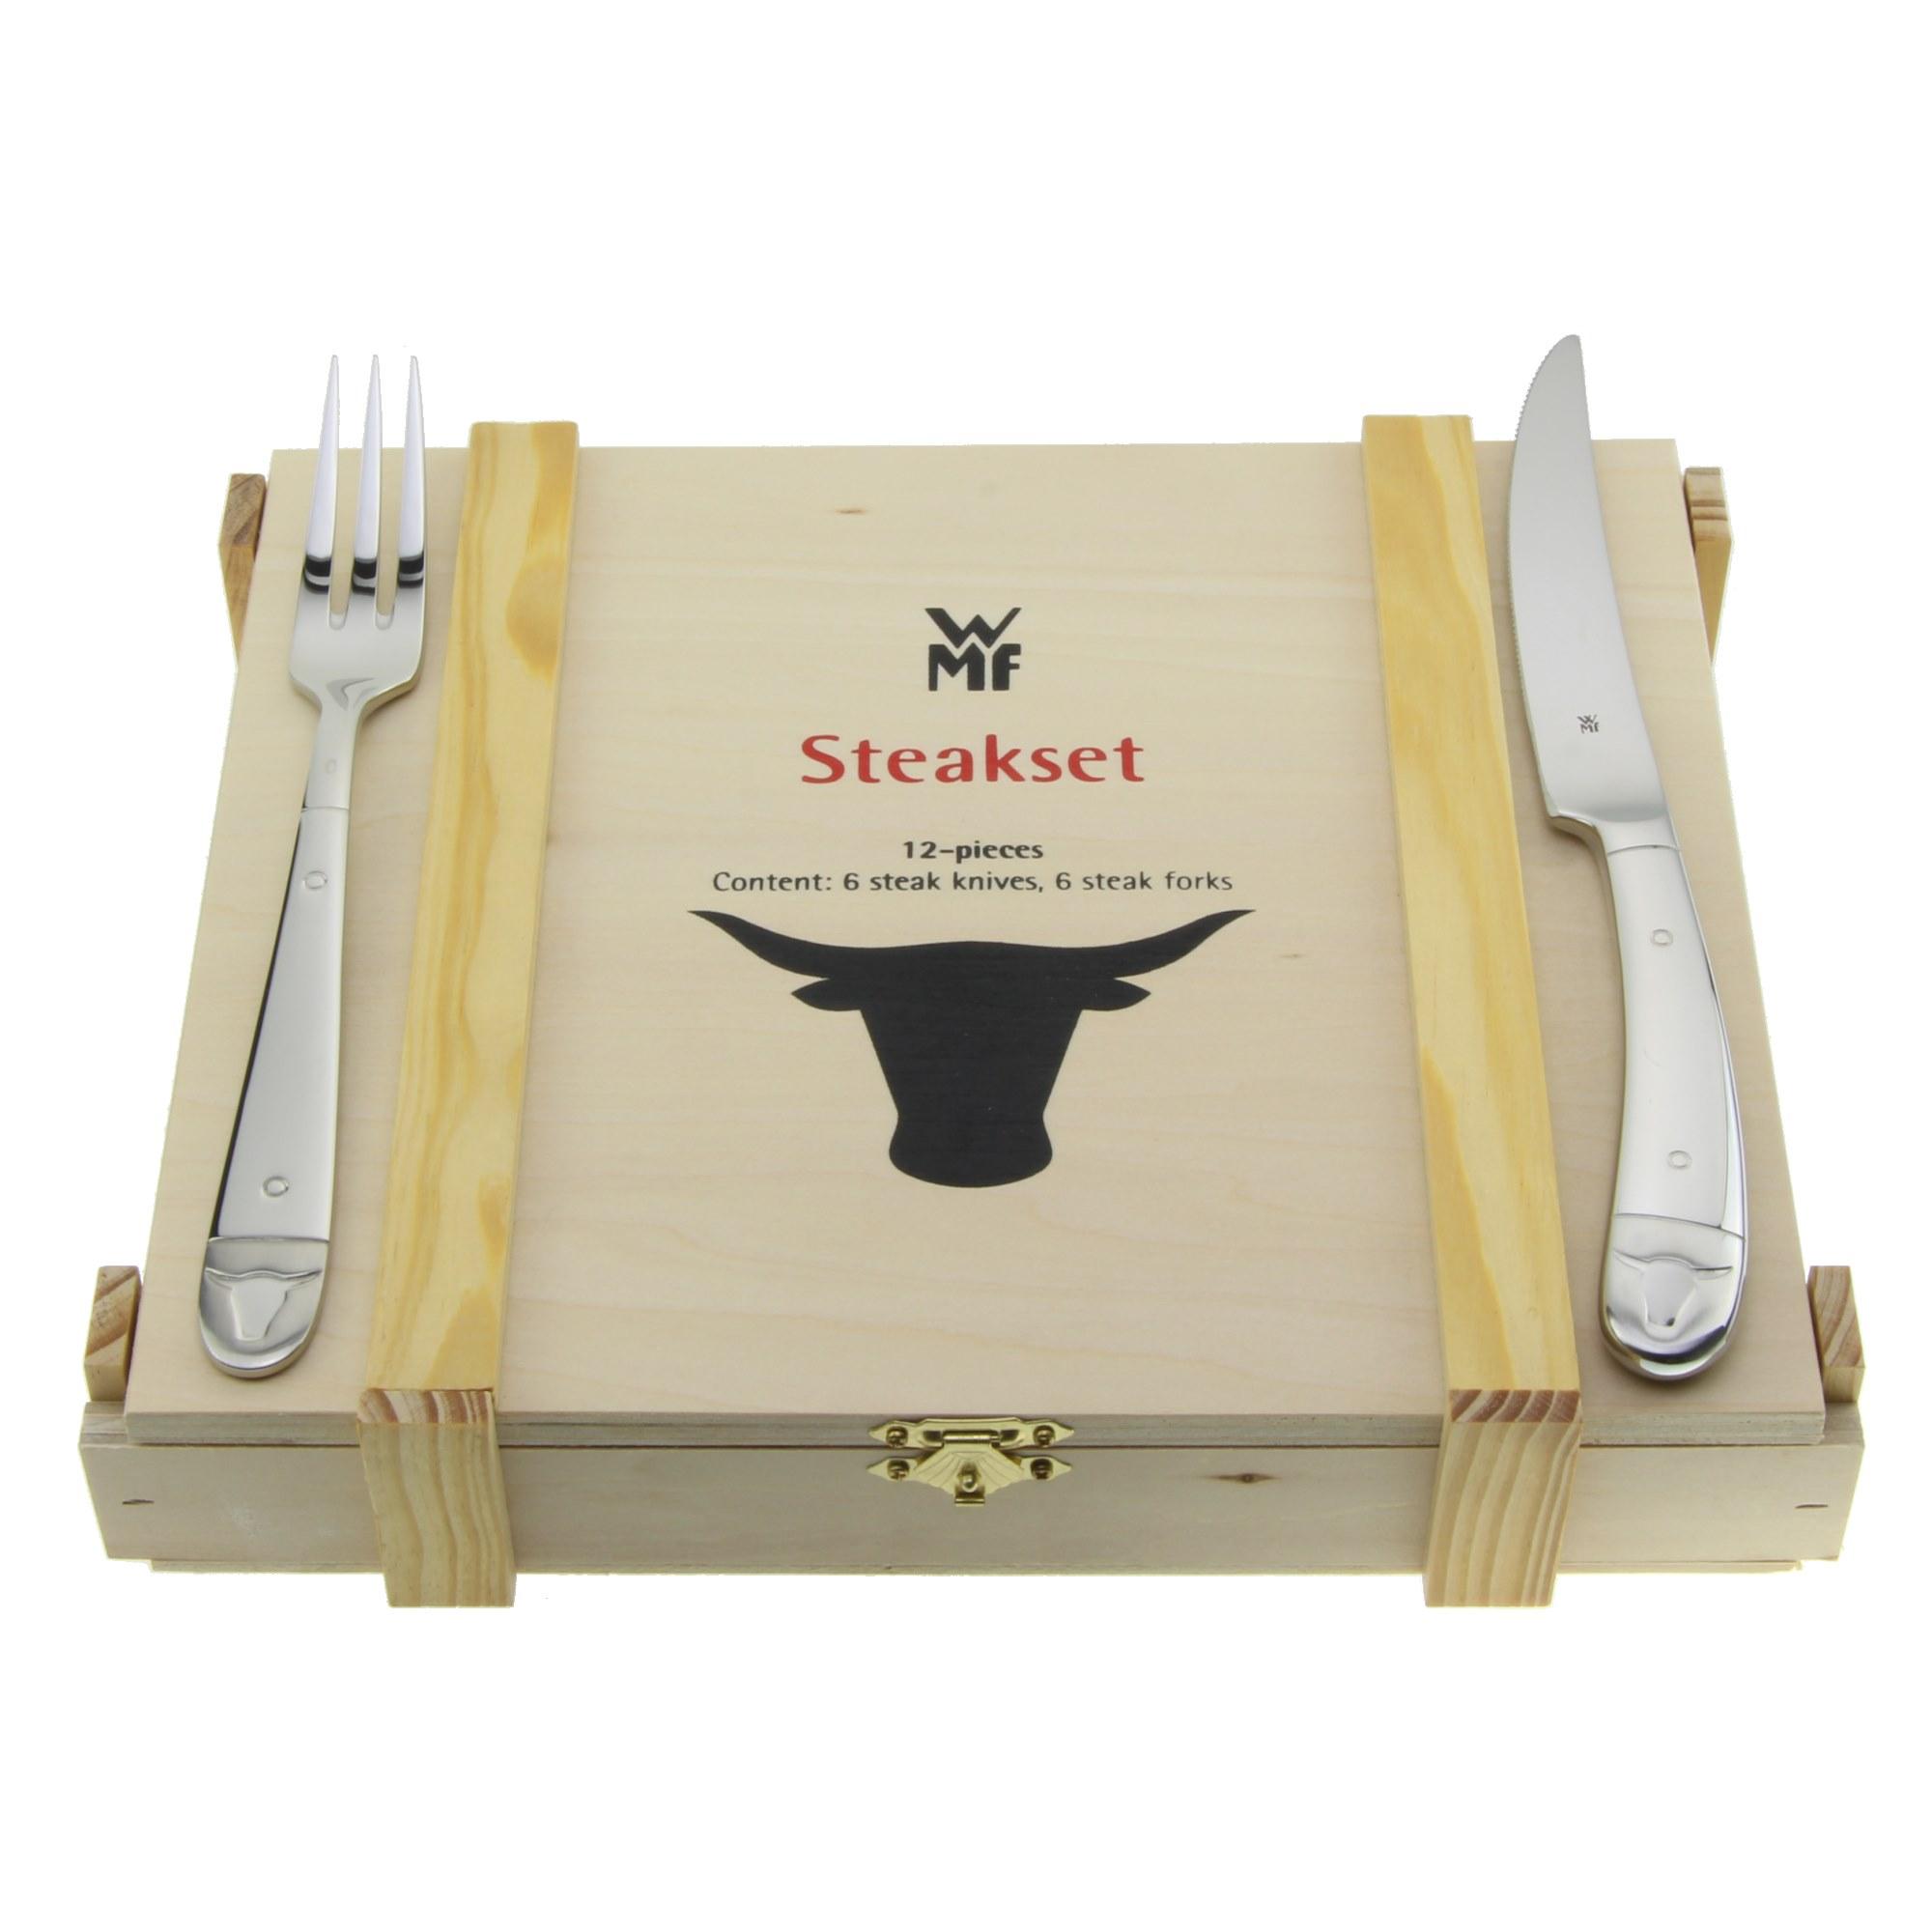 wmf steakbesteck grillbesteck set 12 teilig stierkopf holzbox ebay. Black Bedroom Furniture Sets. Home Design Ideas